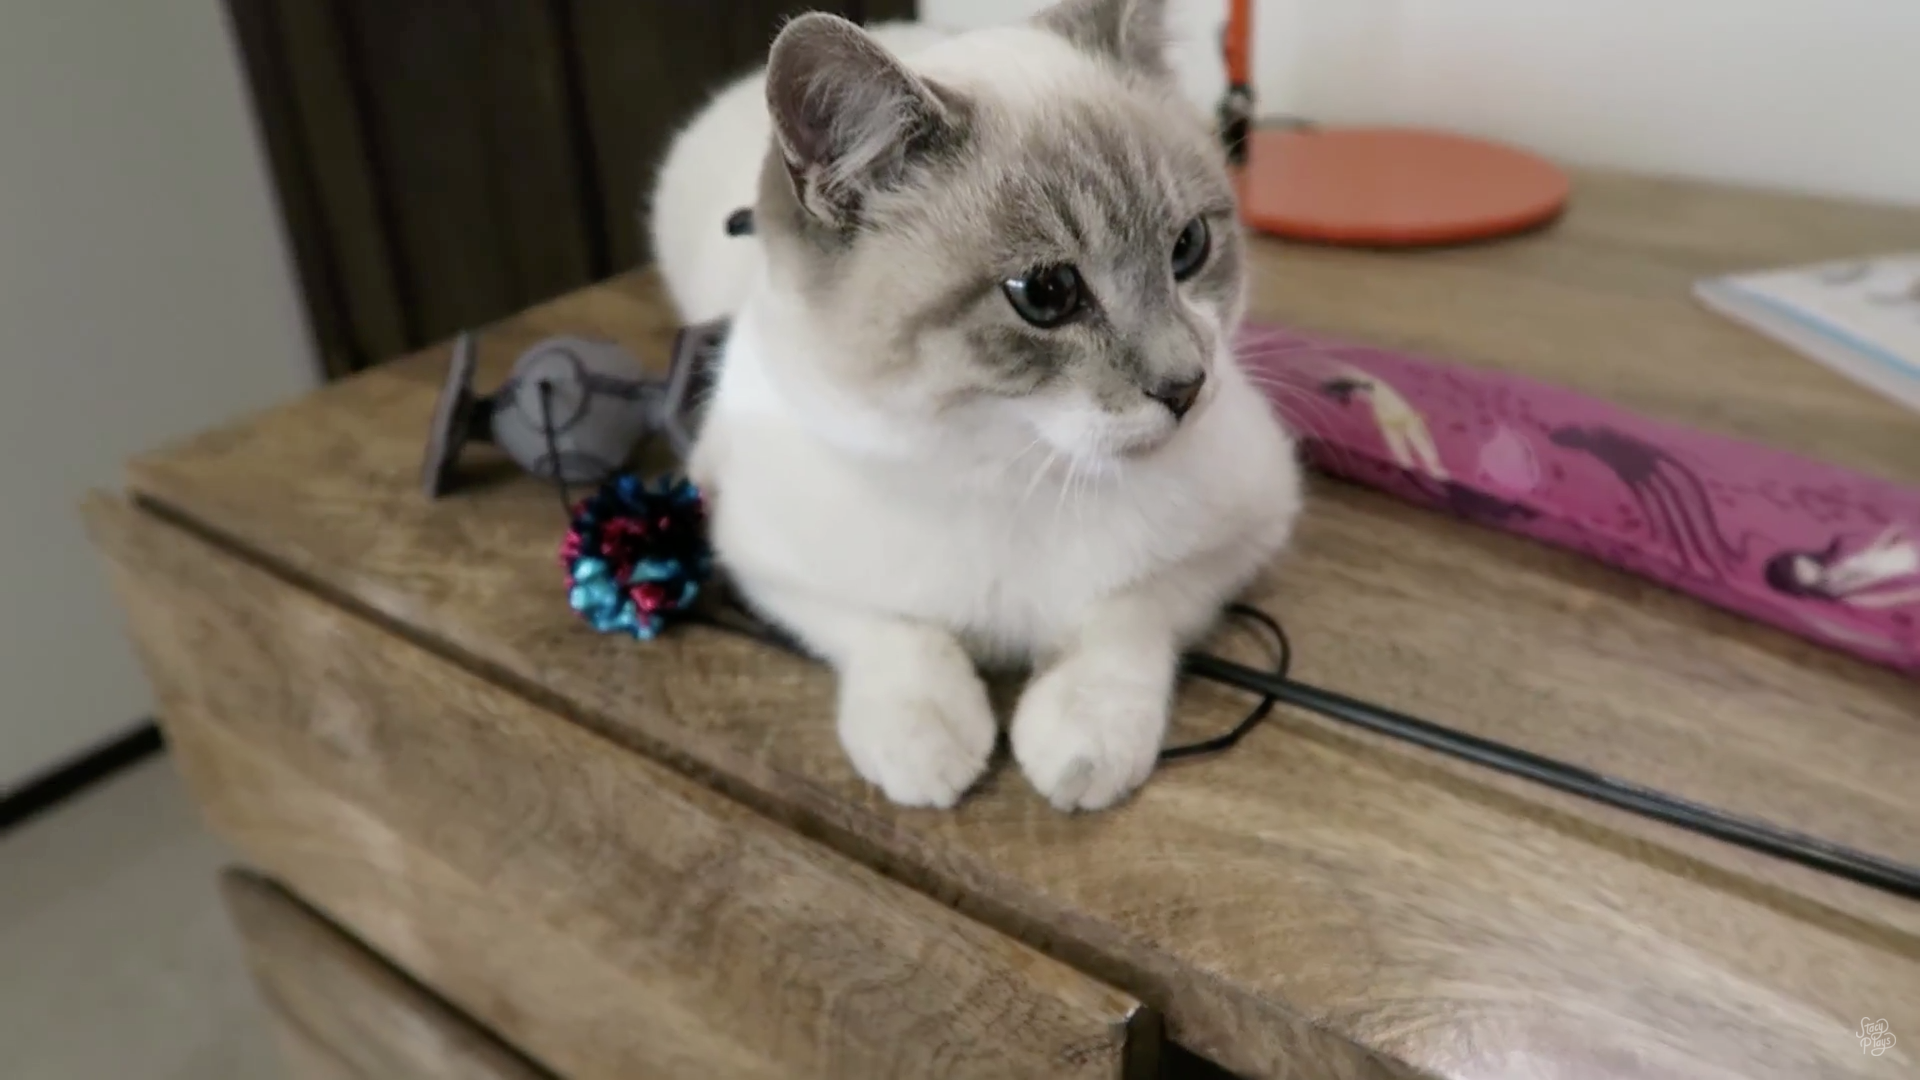 Milquetoast Stacy Plays Cat Cute Animals Cute Cats Cats